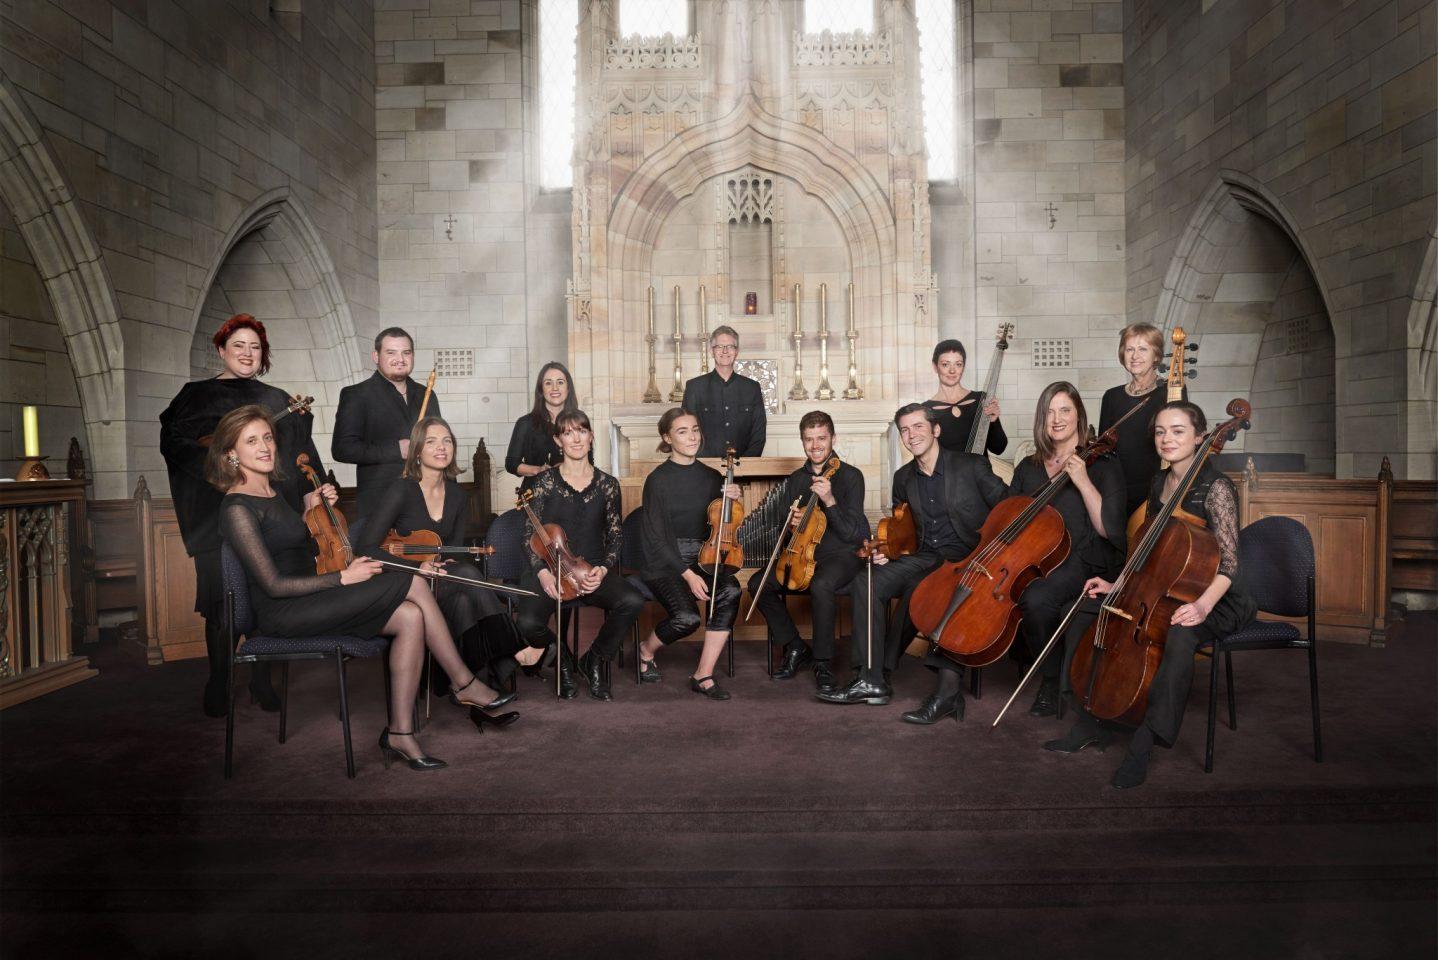 Melbourne Baroque Orchestra